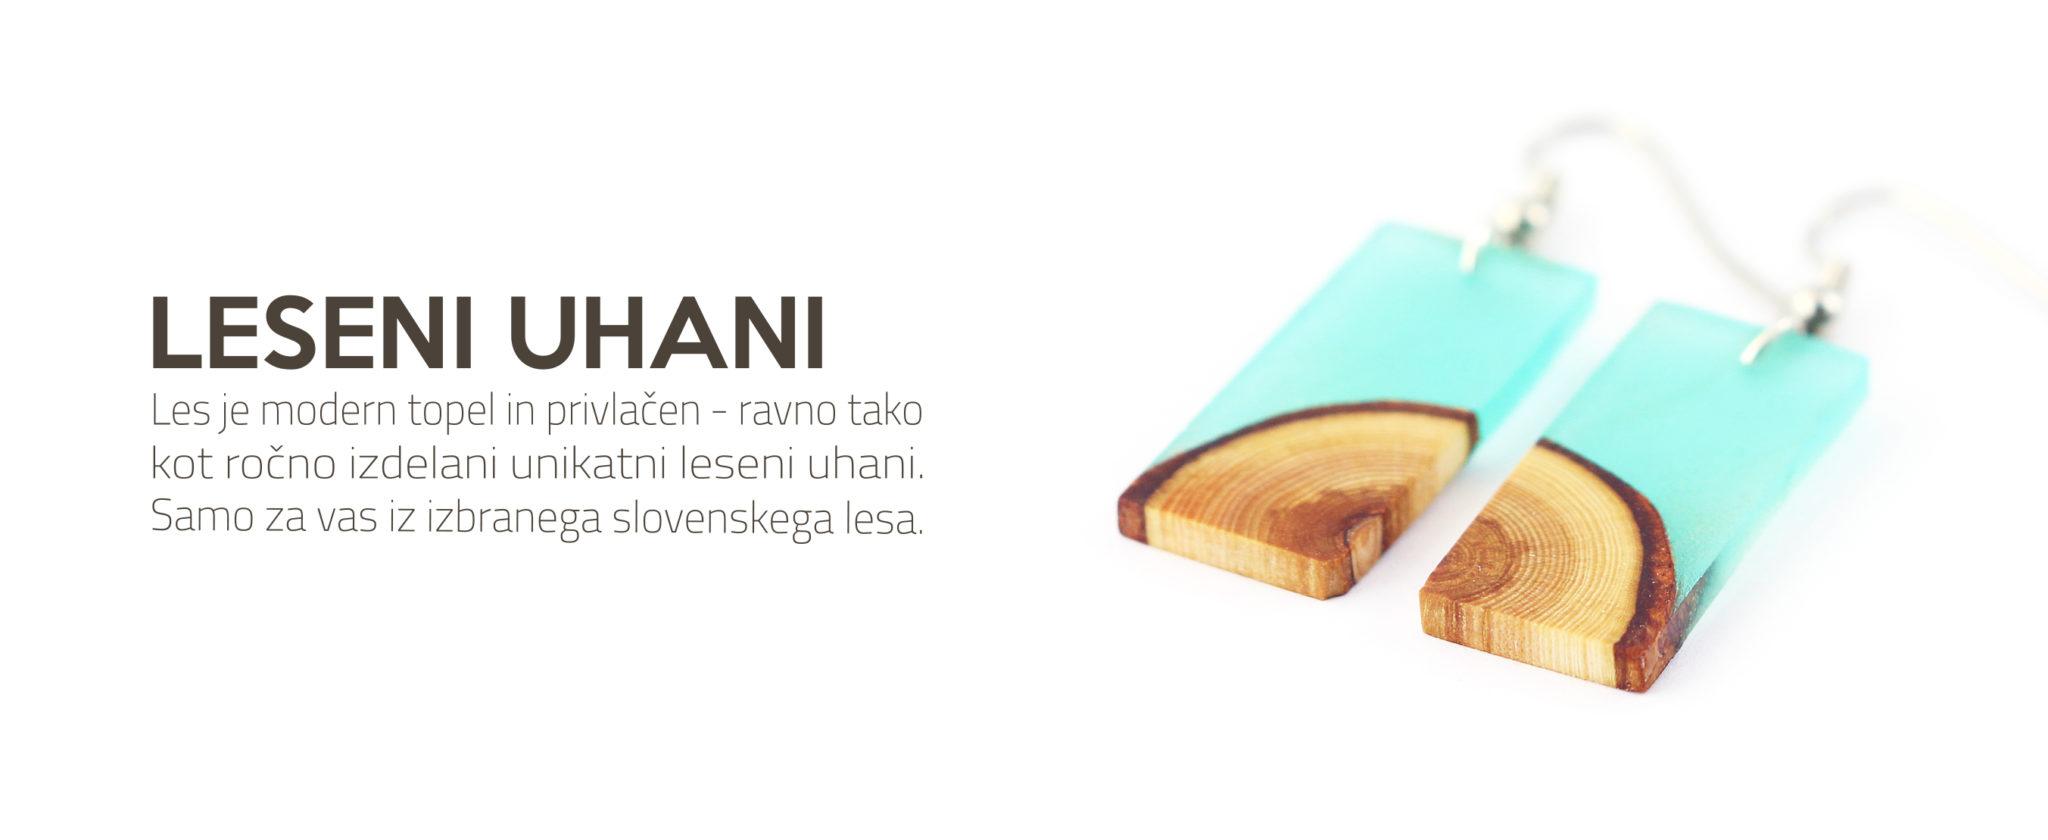 slider_uhani_text_1